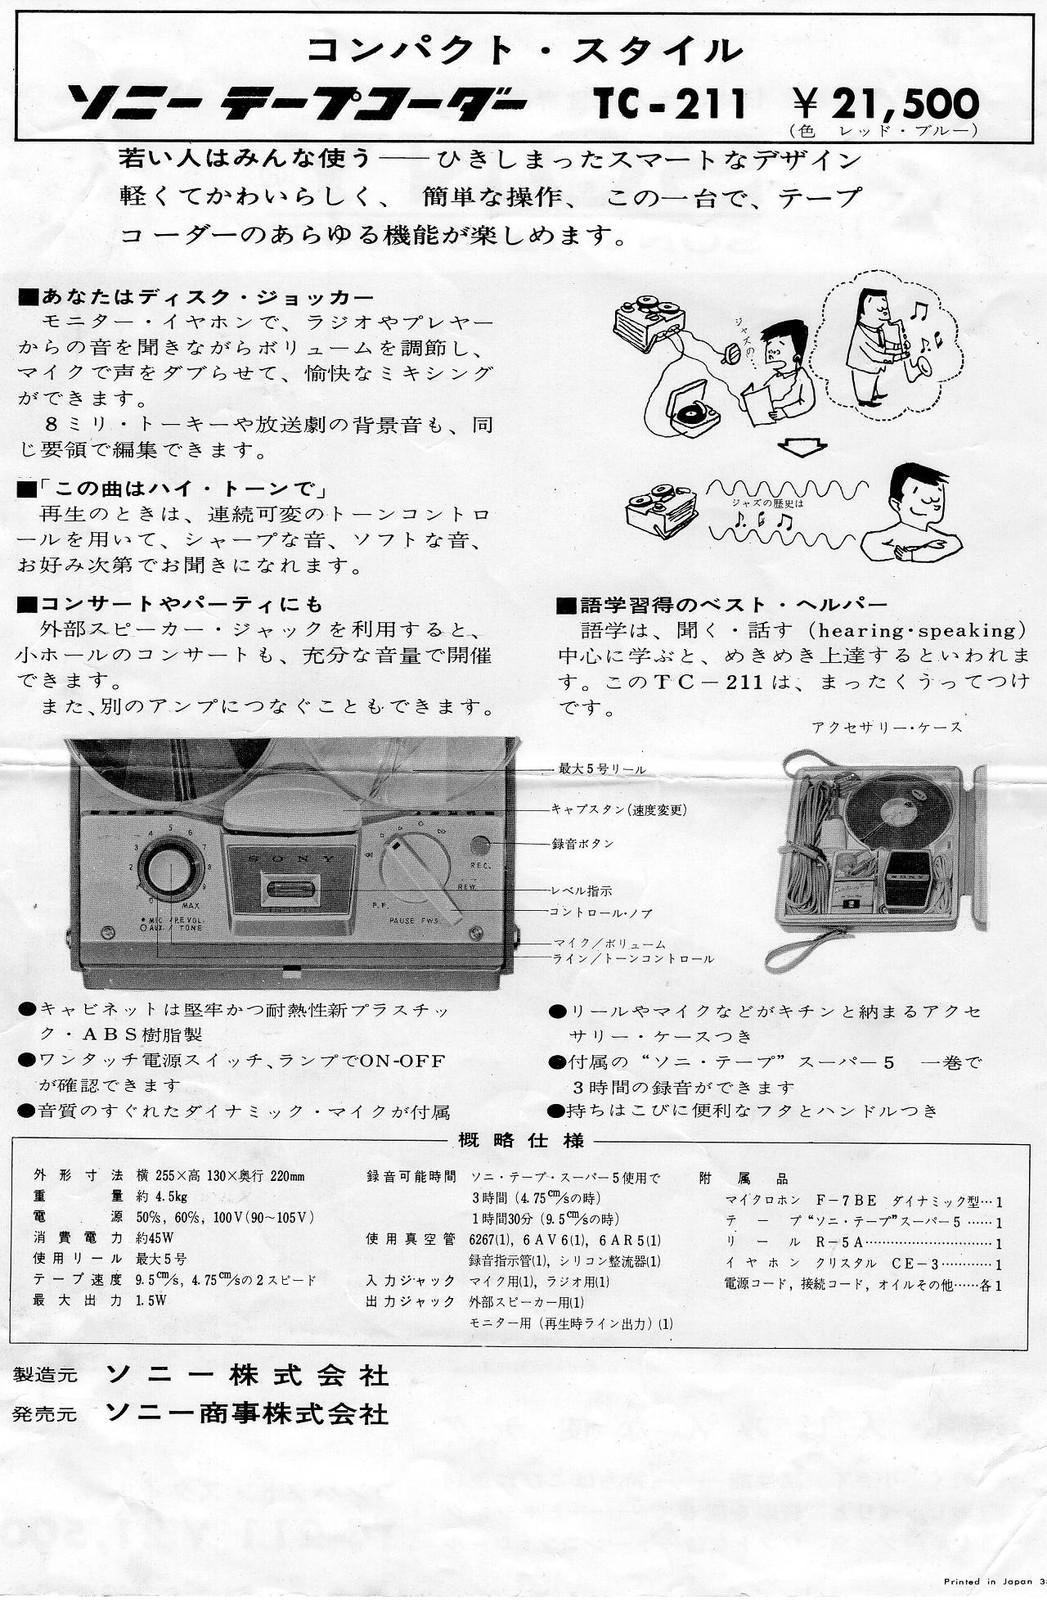 Sony_tc211_s_2